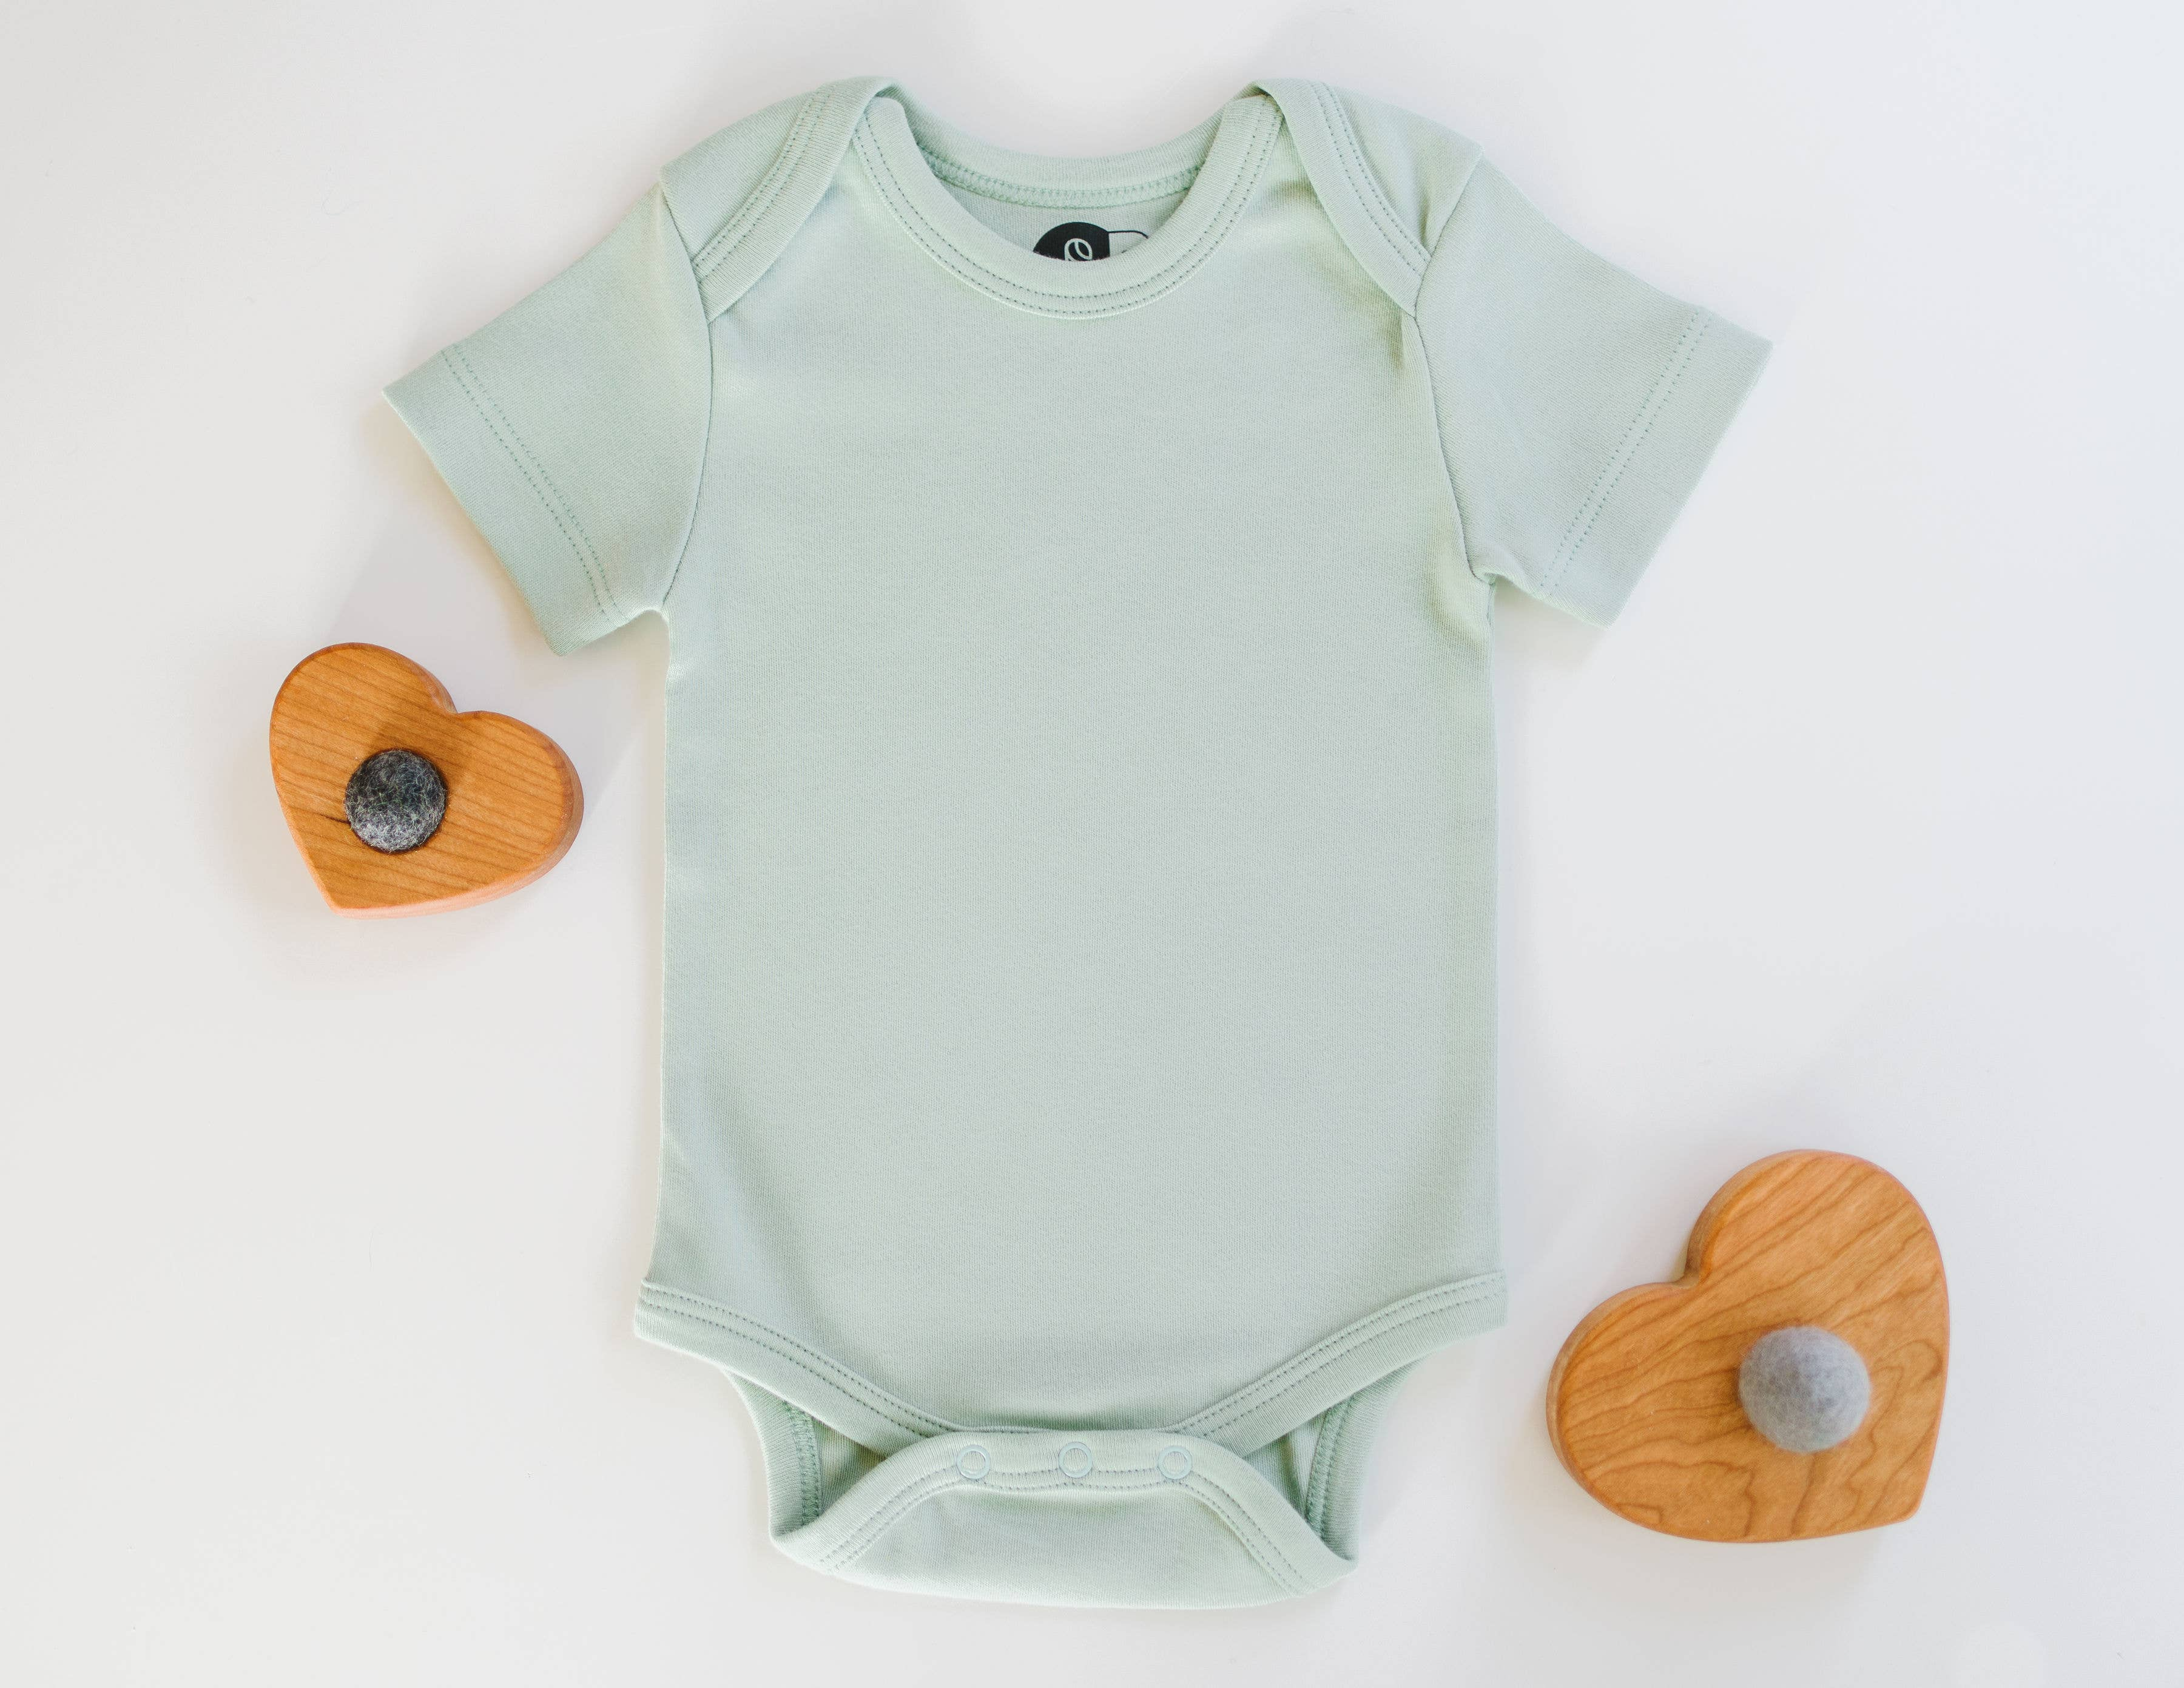 Short Sleeve Cotton Bodysuit for Baby Boys and Girls Fashion Infinity Peace Hope Faith Love Playsuit